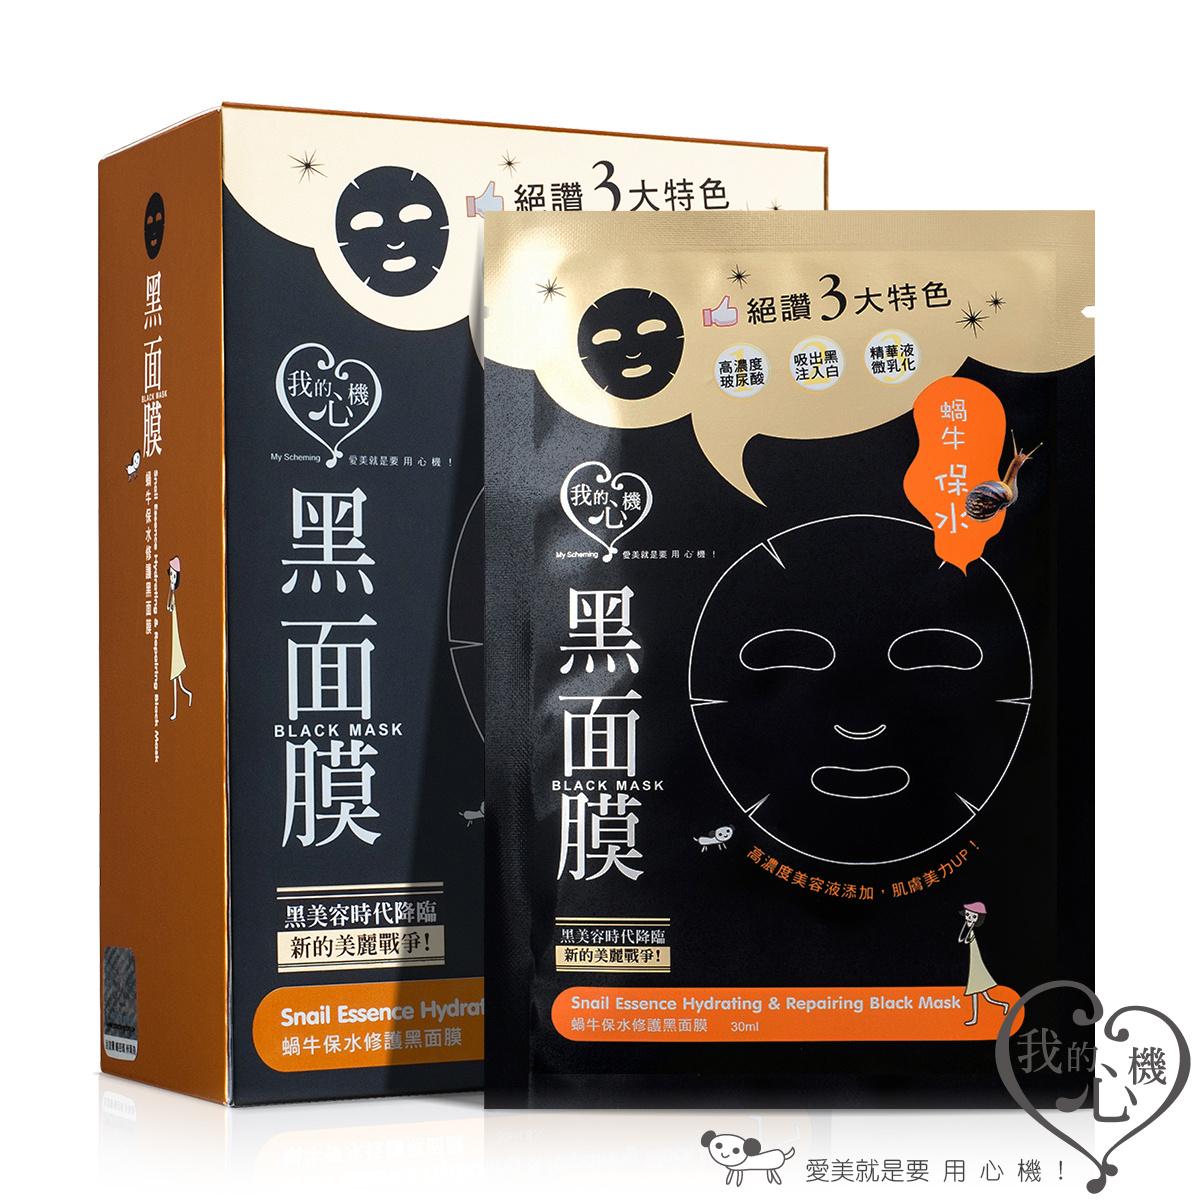 Snail Essence Hydrating & Repairing Black Mask (8 pcs)-1